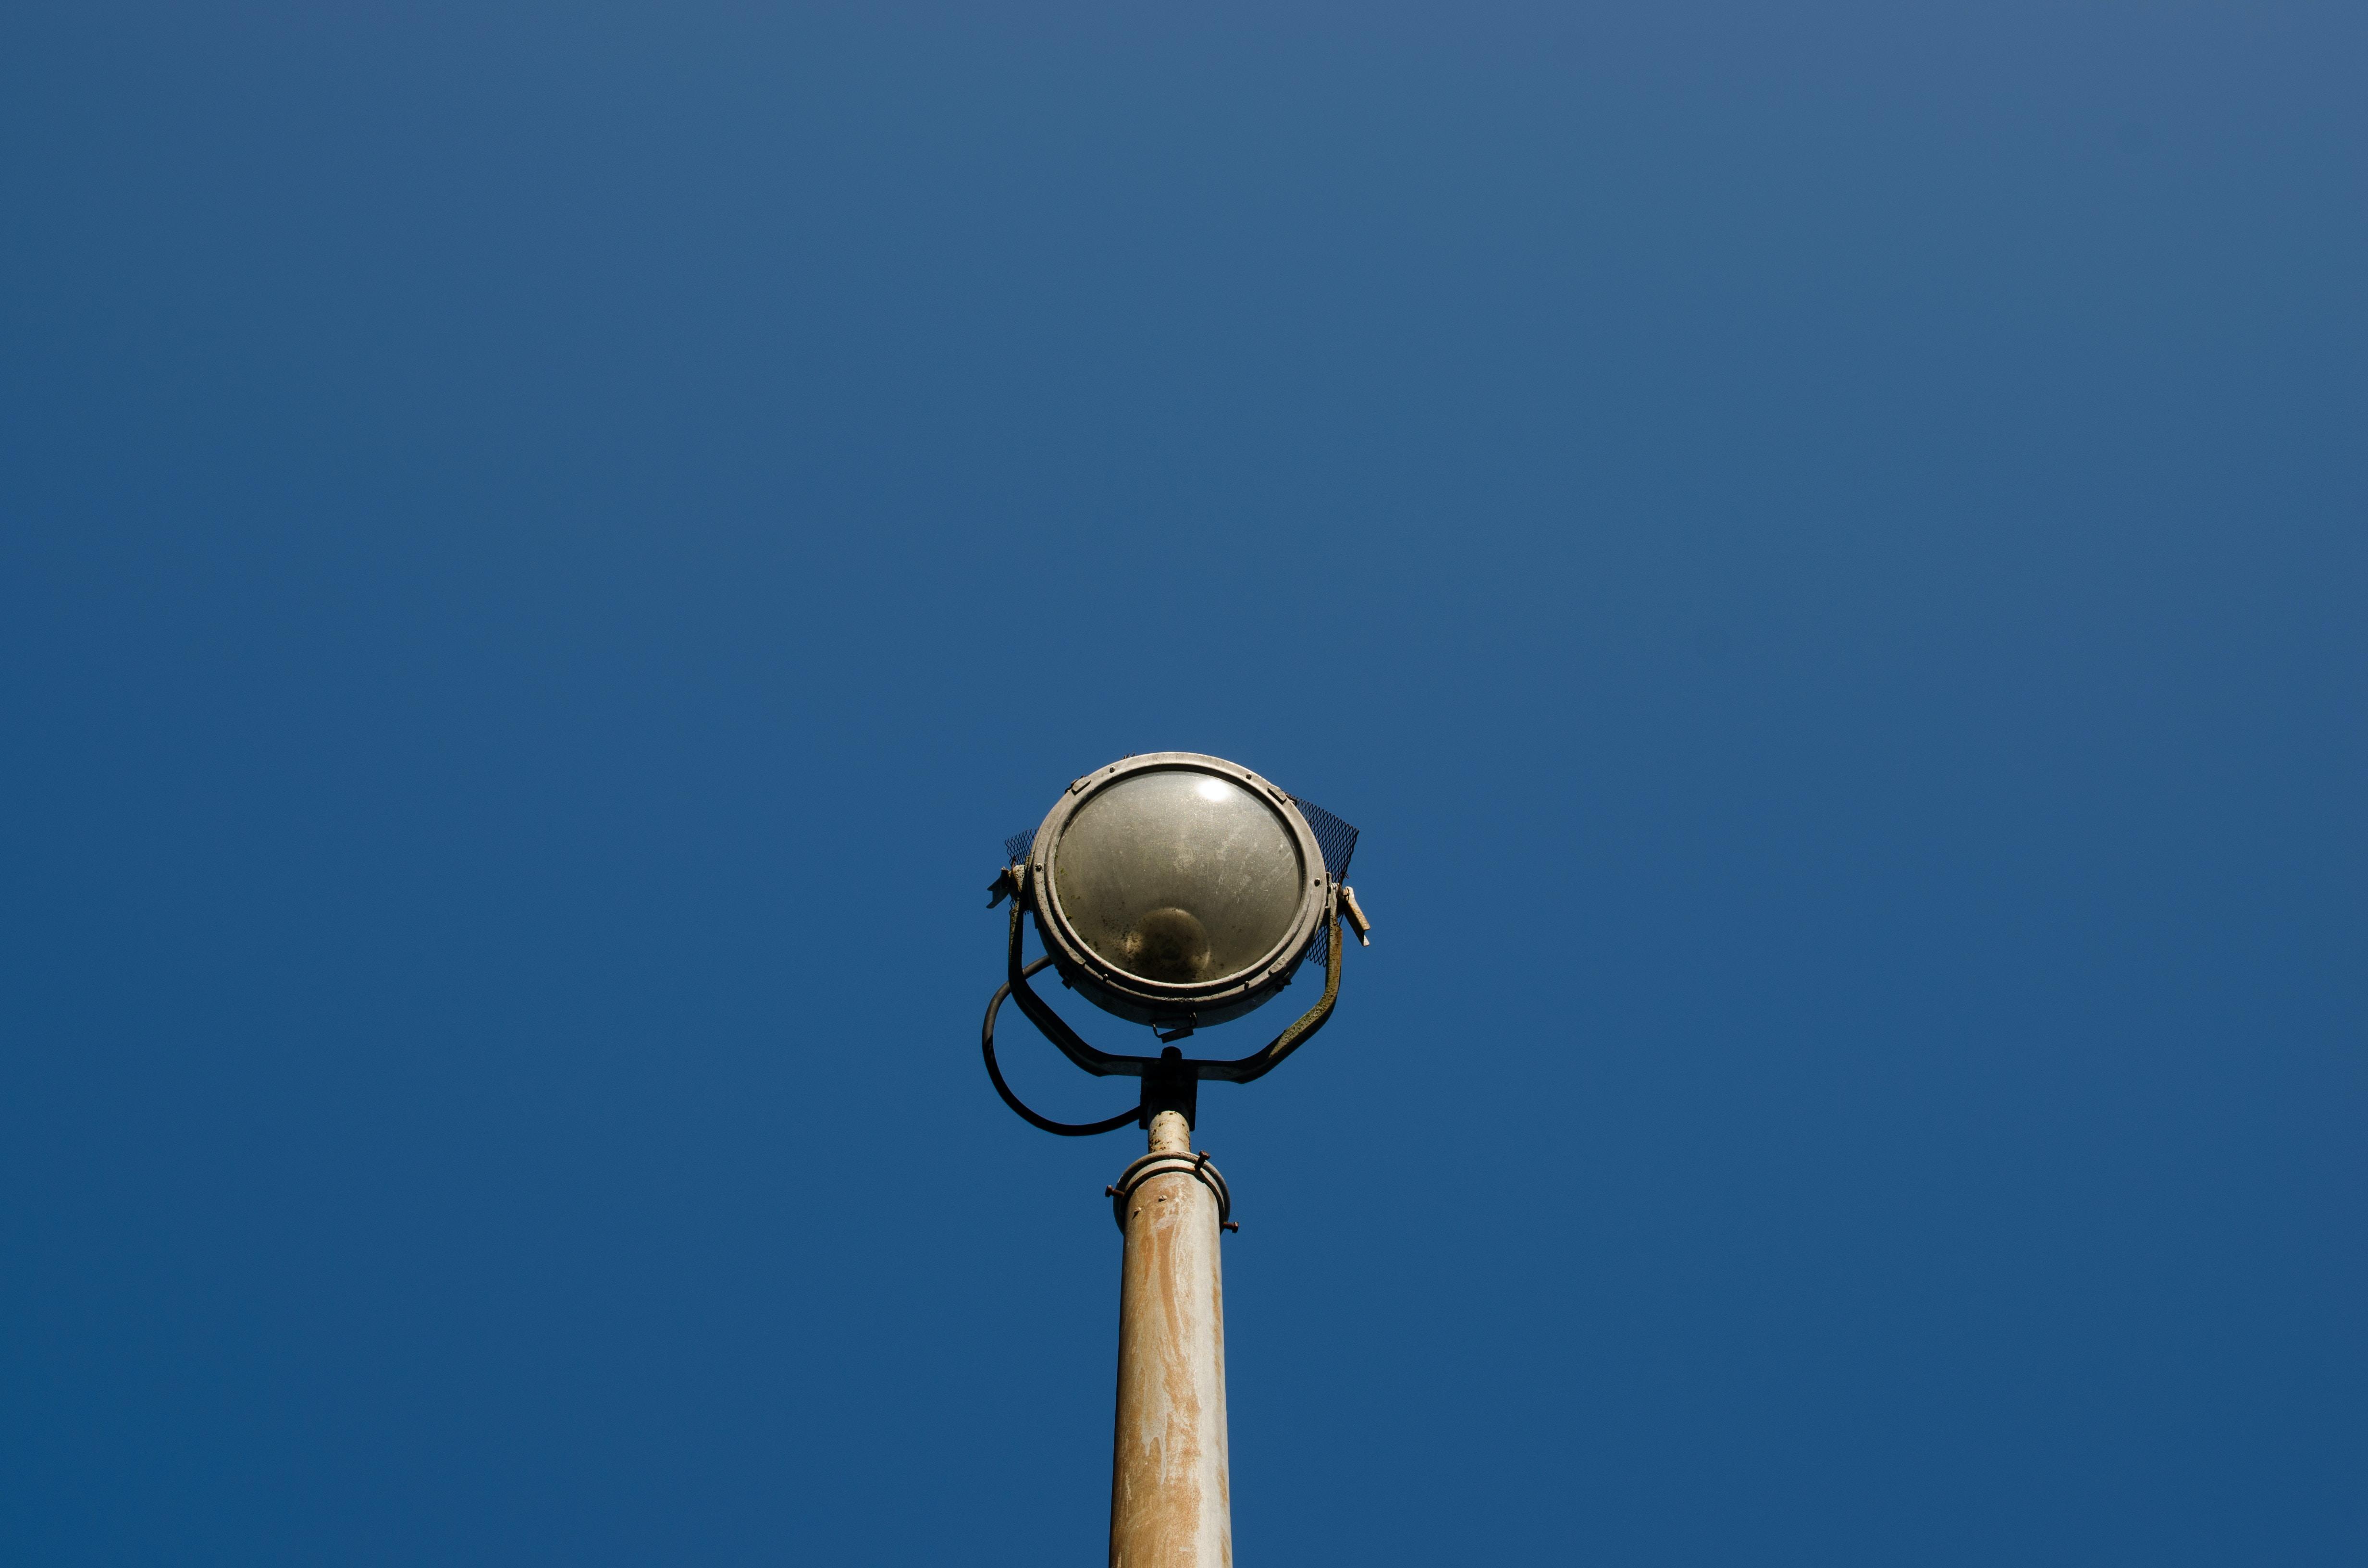 Free Unsplash photo from Nathan Ziemkowsky